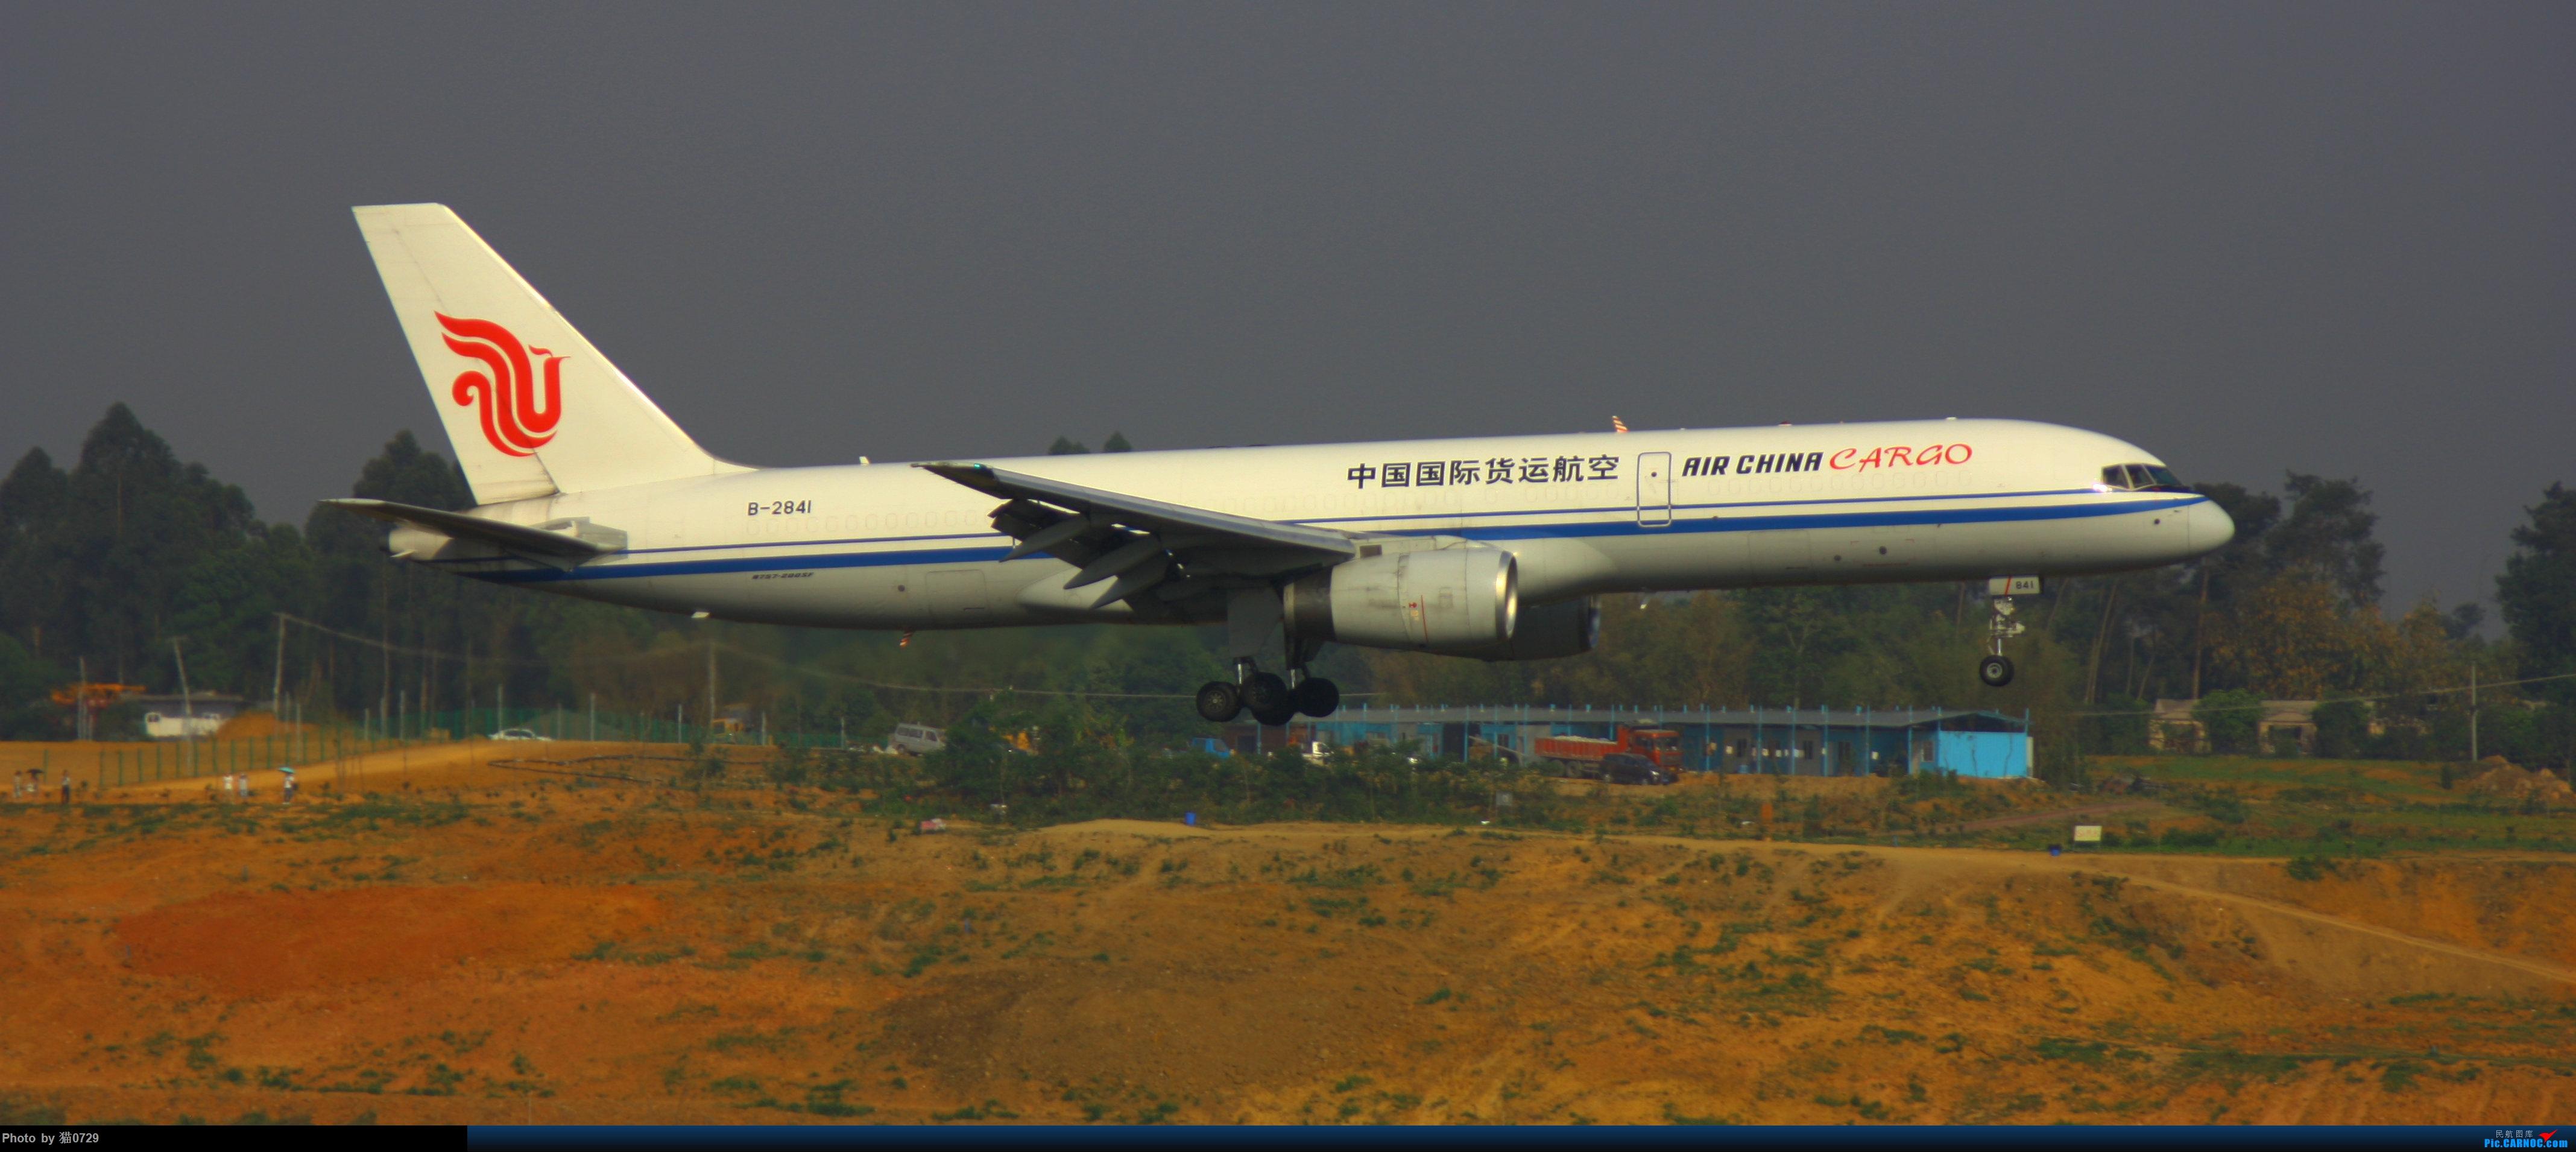 Re:[原创]跑道洞两右,气温三拐,六点五小时坚守双流 BOEING 757-200 B-2841 中国成都双流国际机场